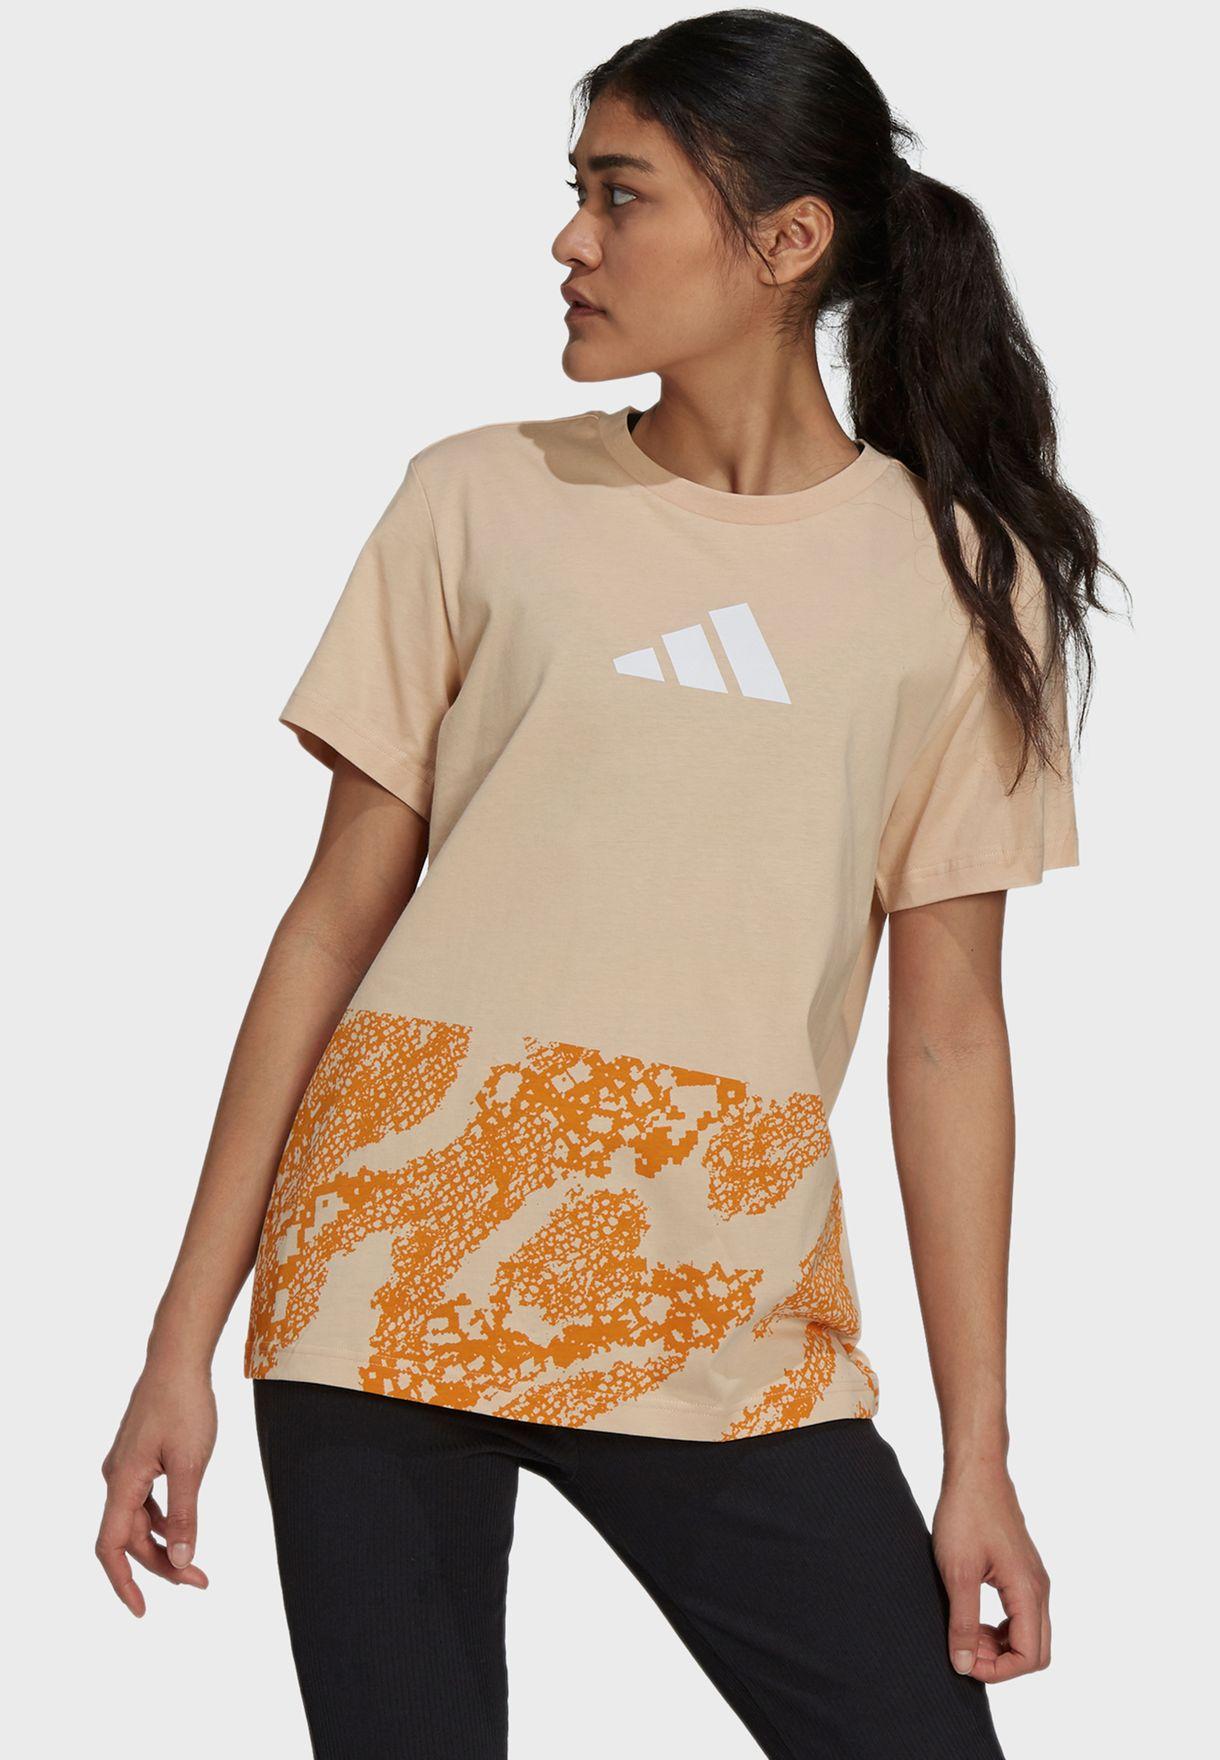 Lace Camo Graphic 2 T-Shirt